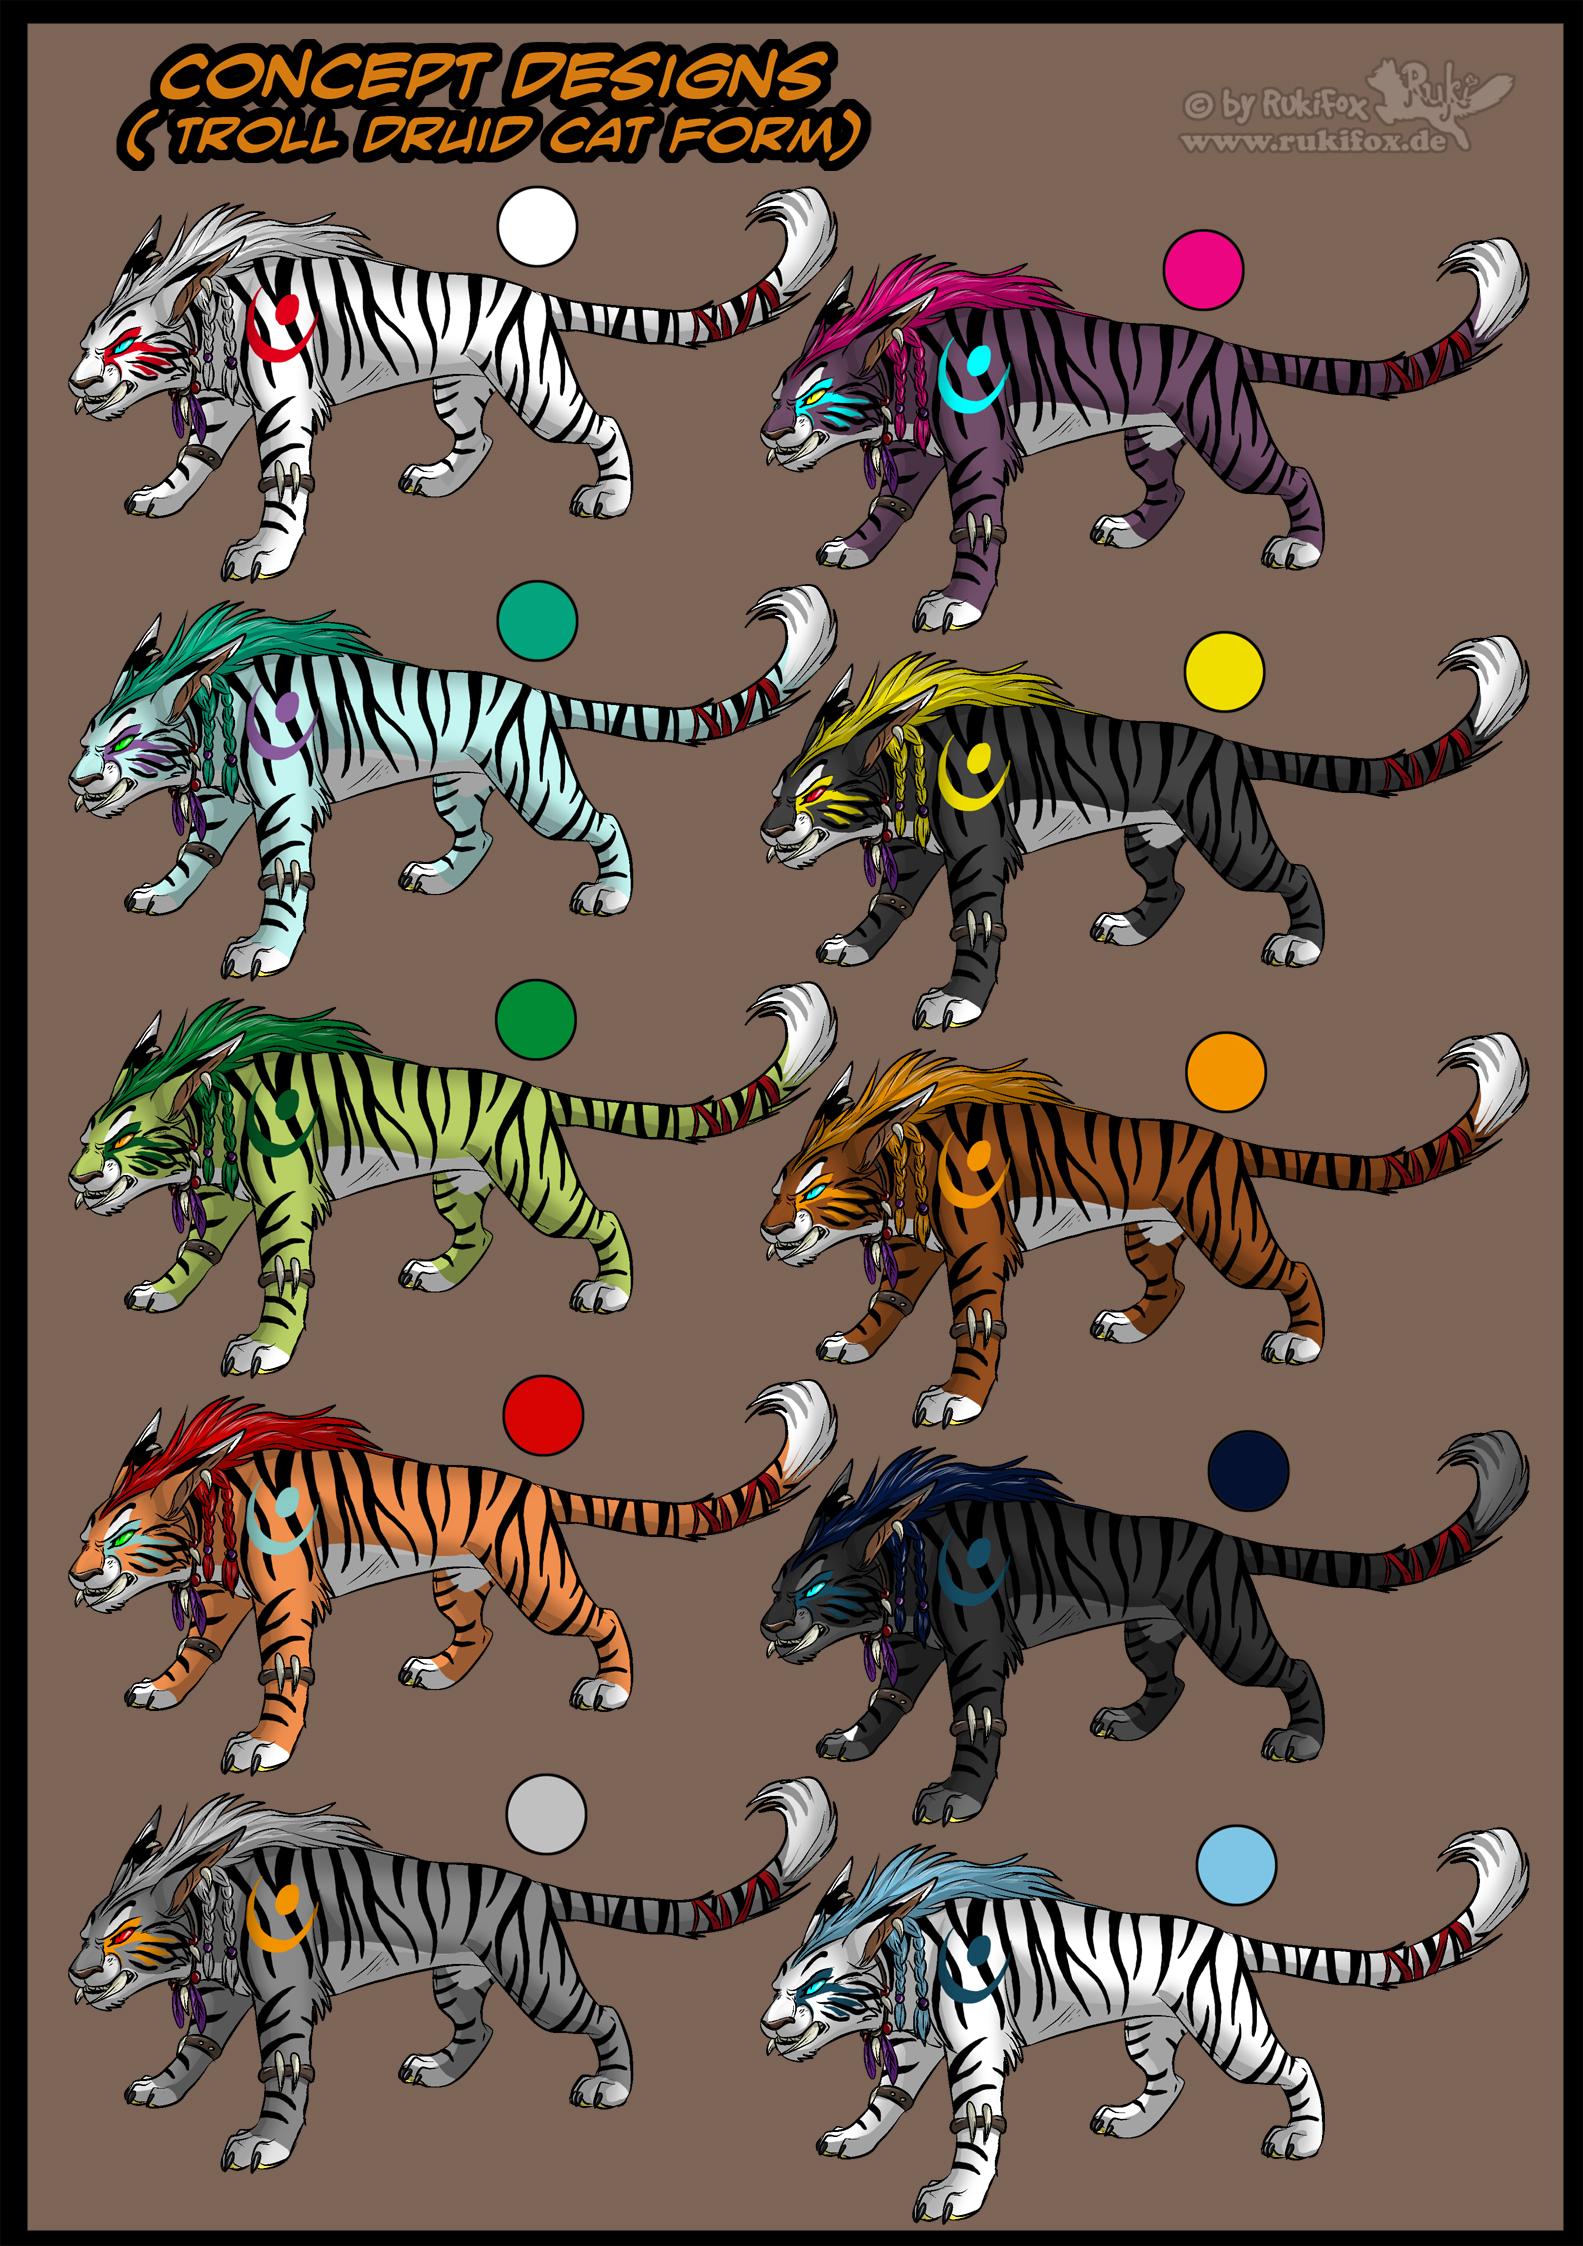 Troll druid cat form design by RukiFox on DeviantArt